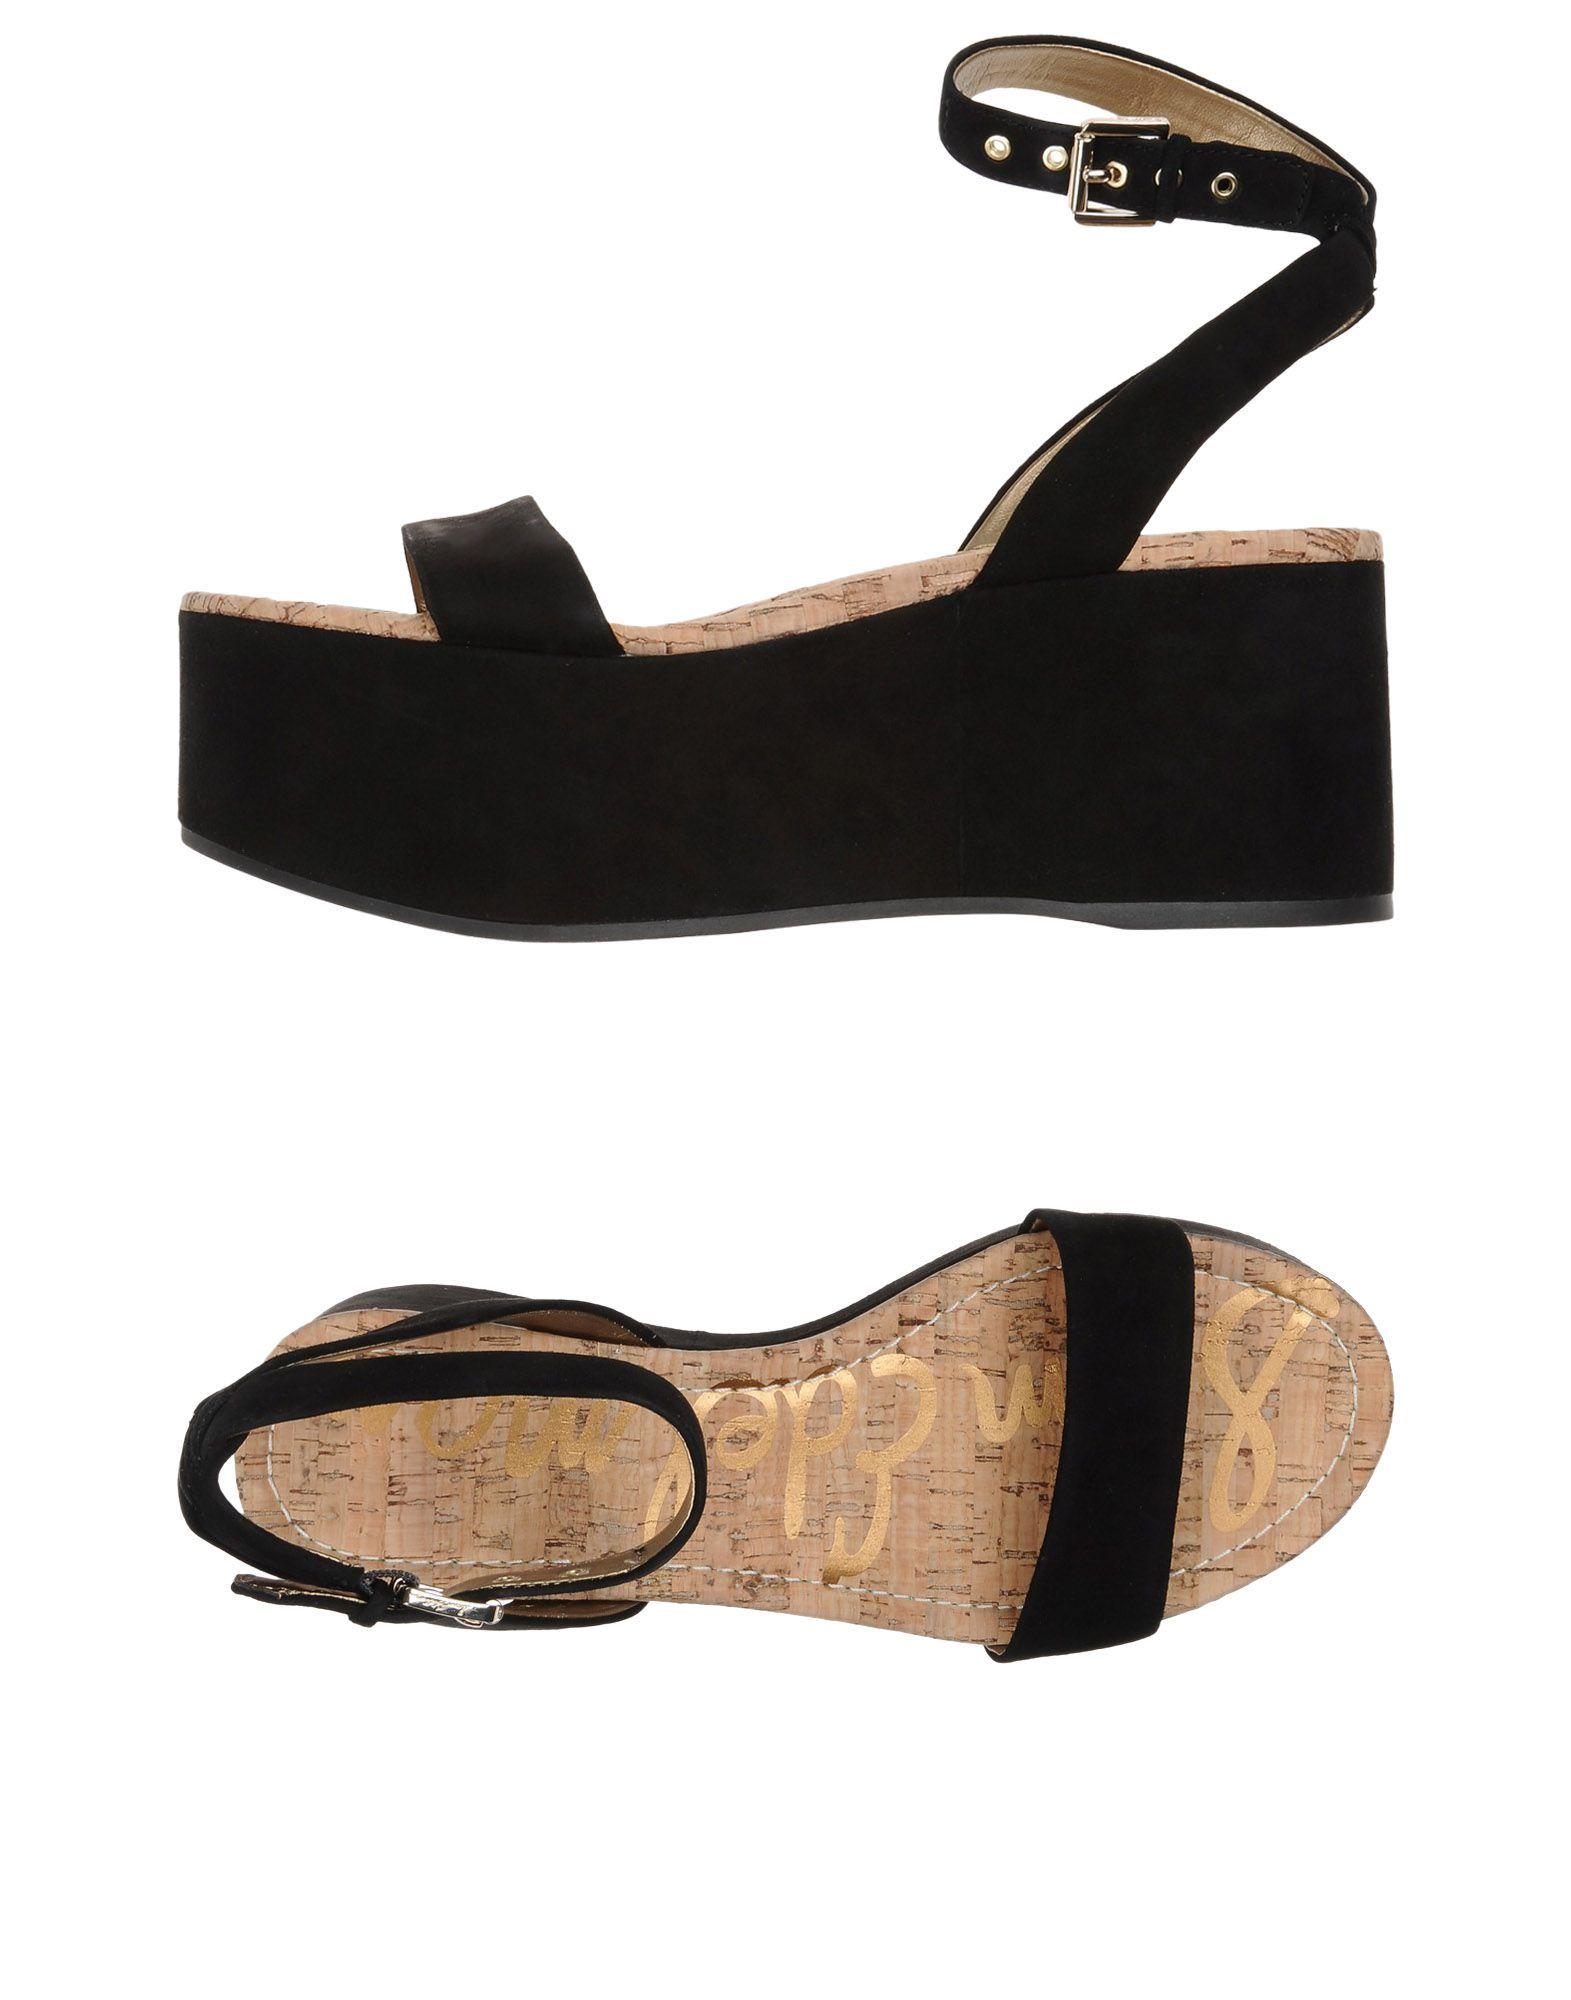 Sam Edelman Black Leather Flatform Sandals